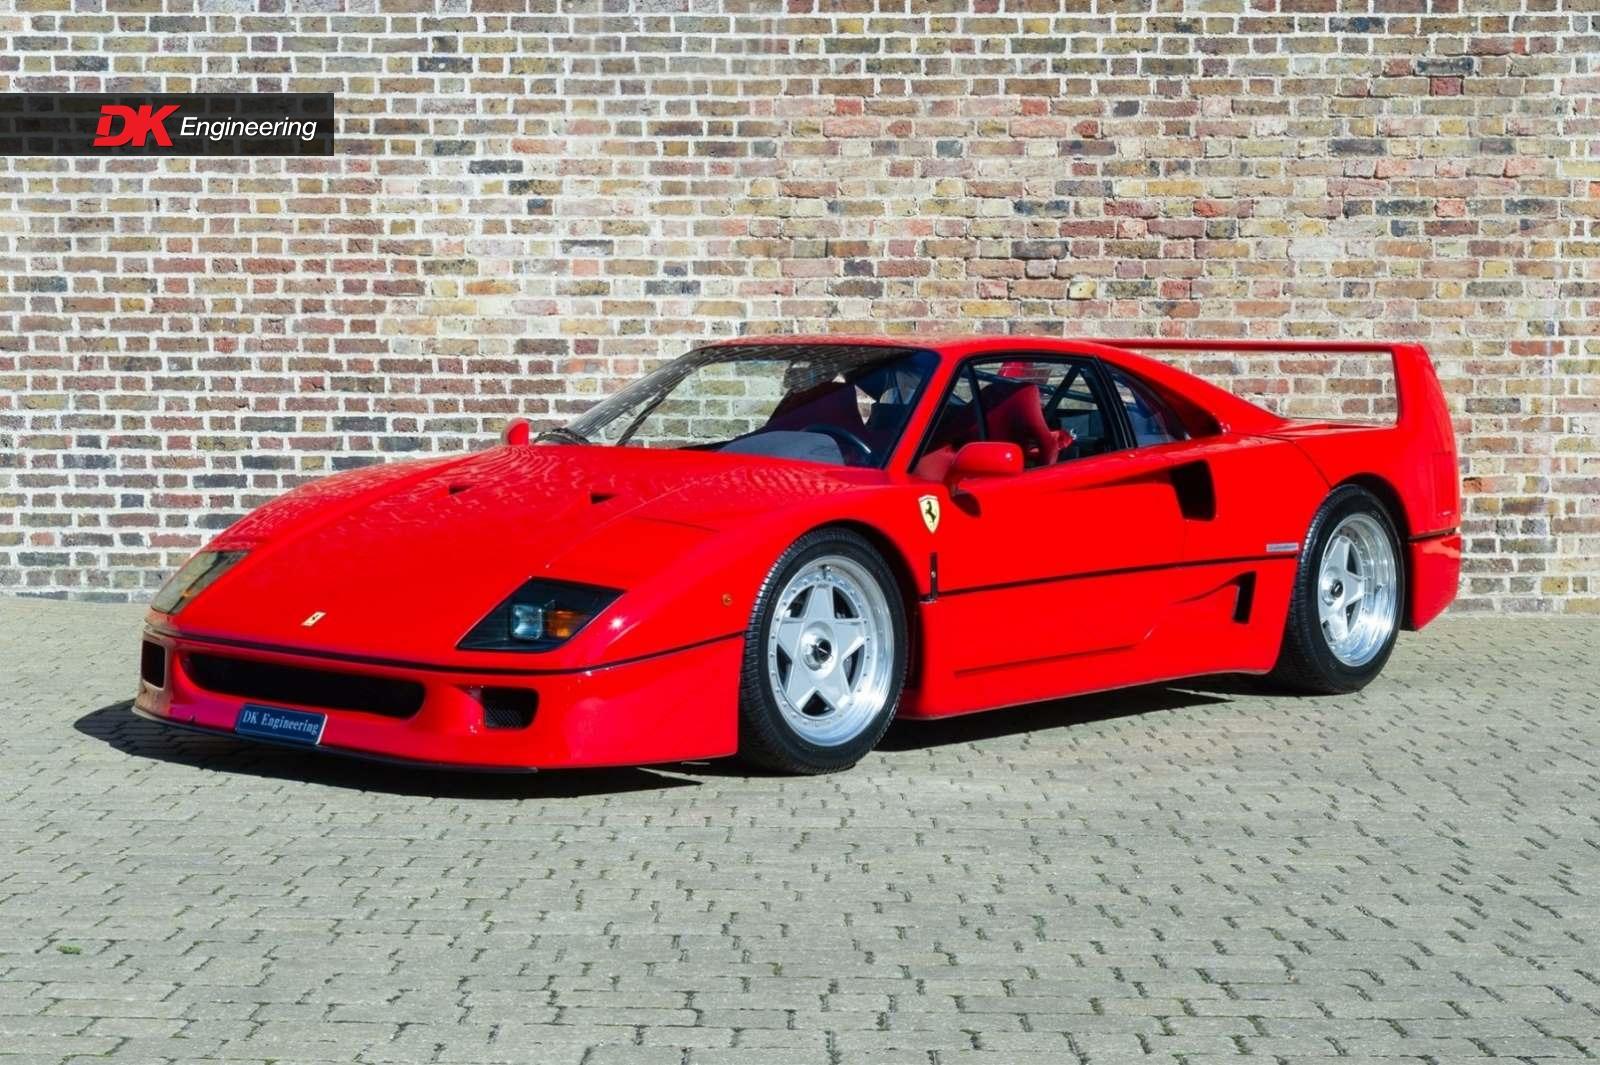 Ferrari F40 for sale - Vehicle Sales - DK Engineering